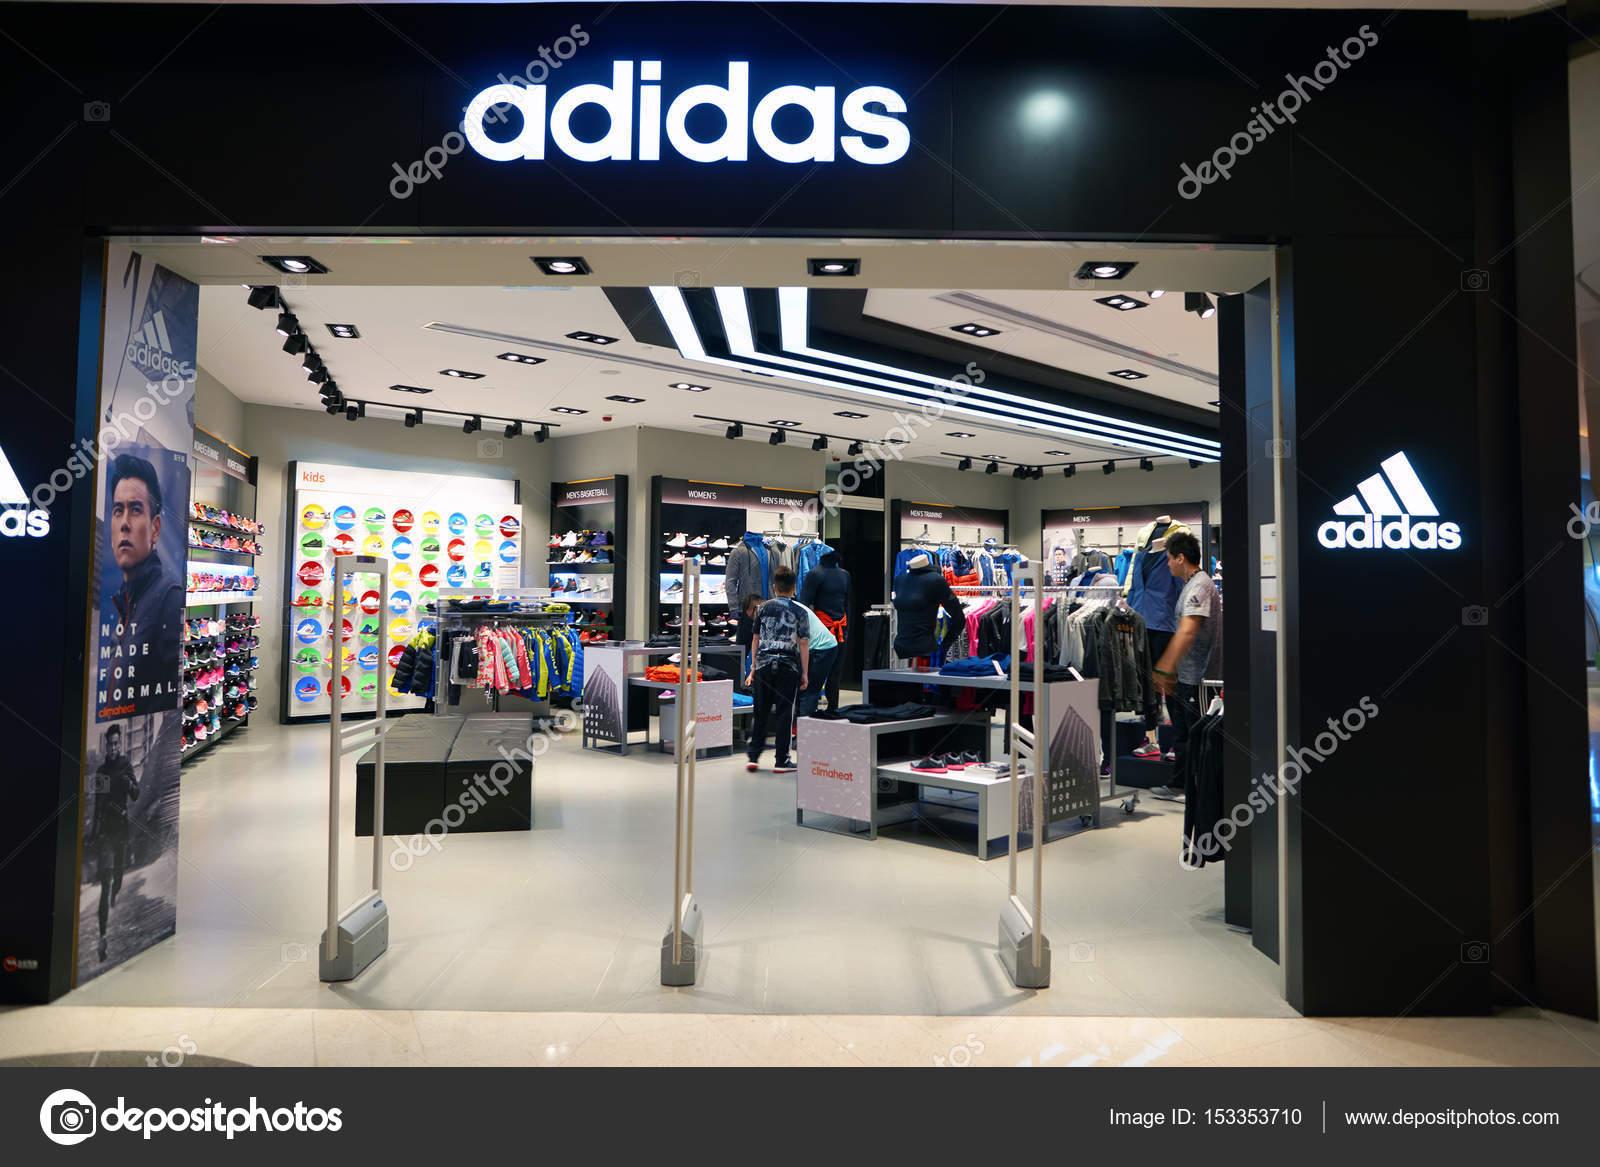 3b25a9c27d5fc Loja Adidas em Hong Kong — Fotografia de Stock Editorial © teamtime ...